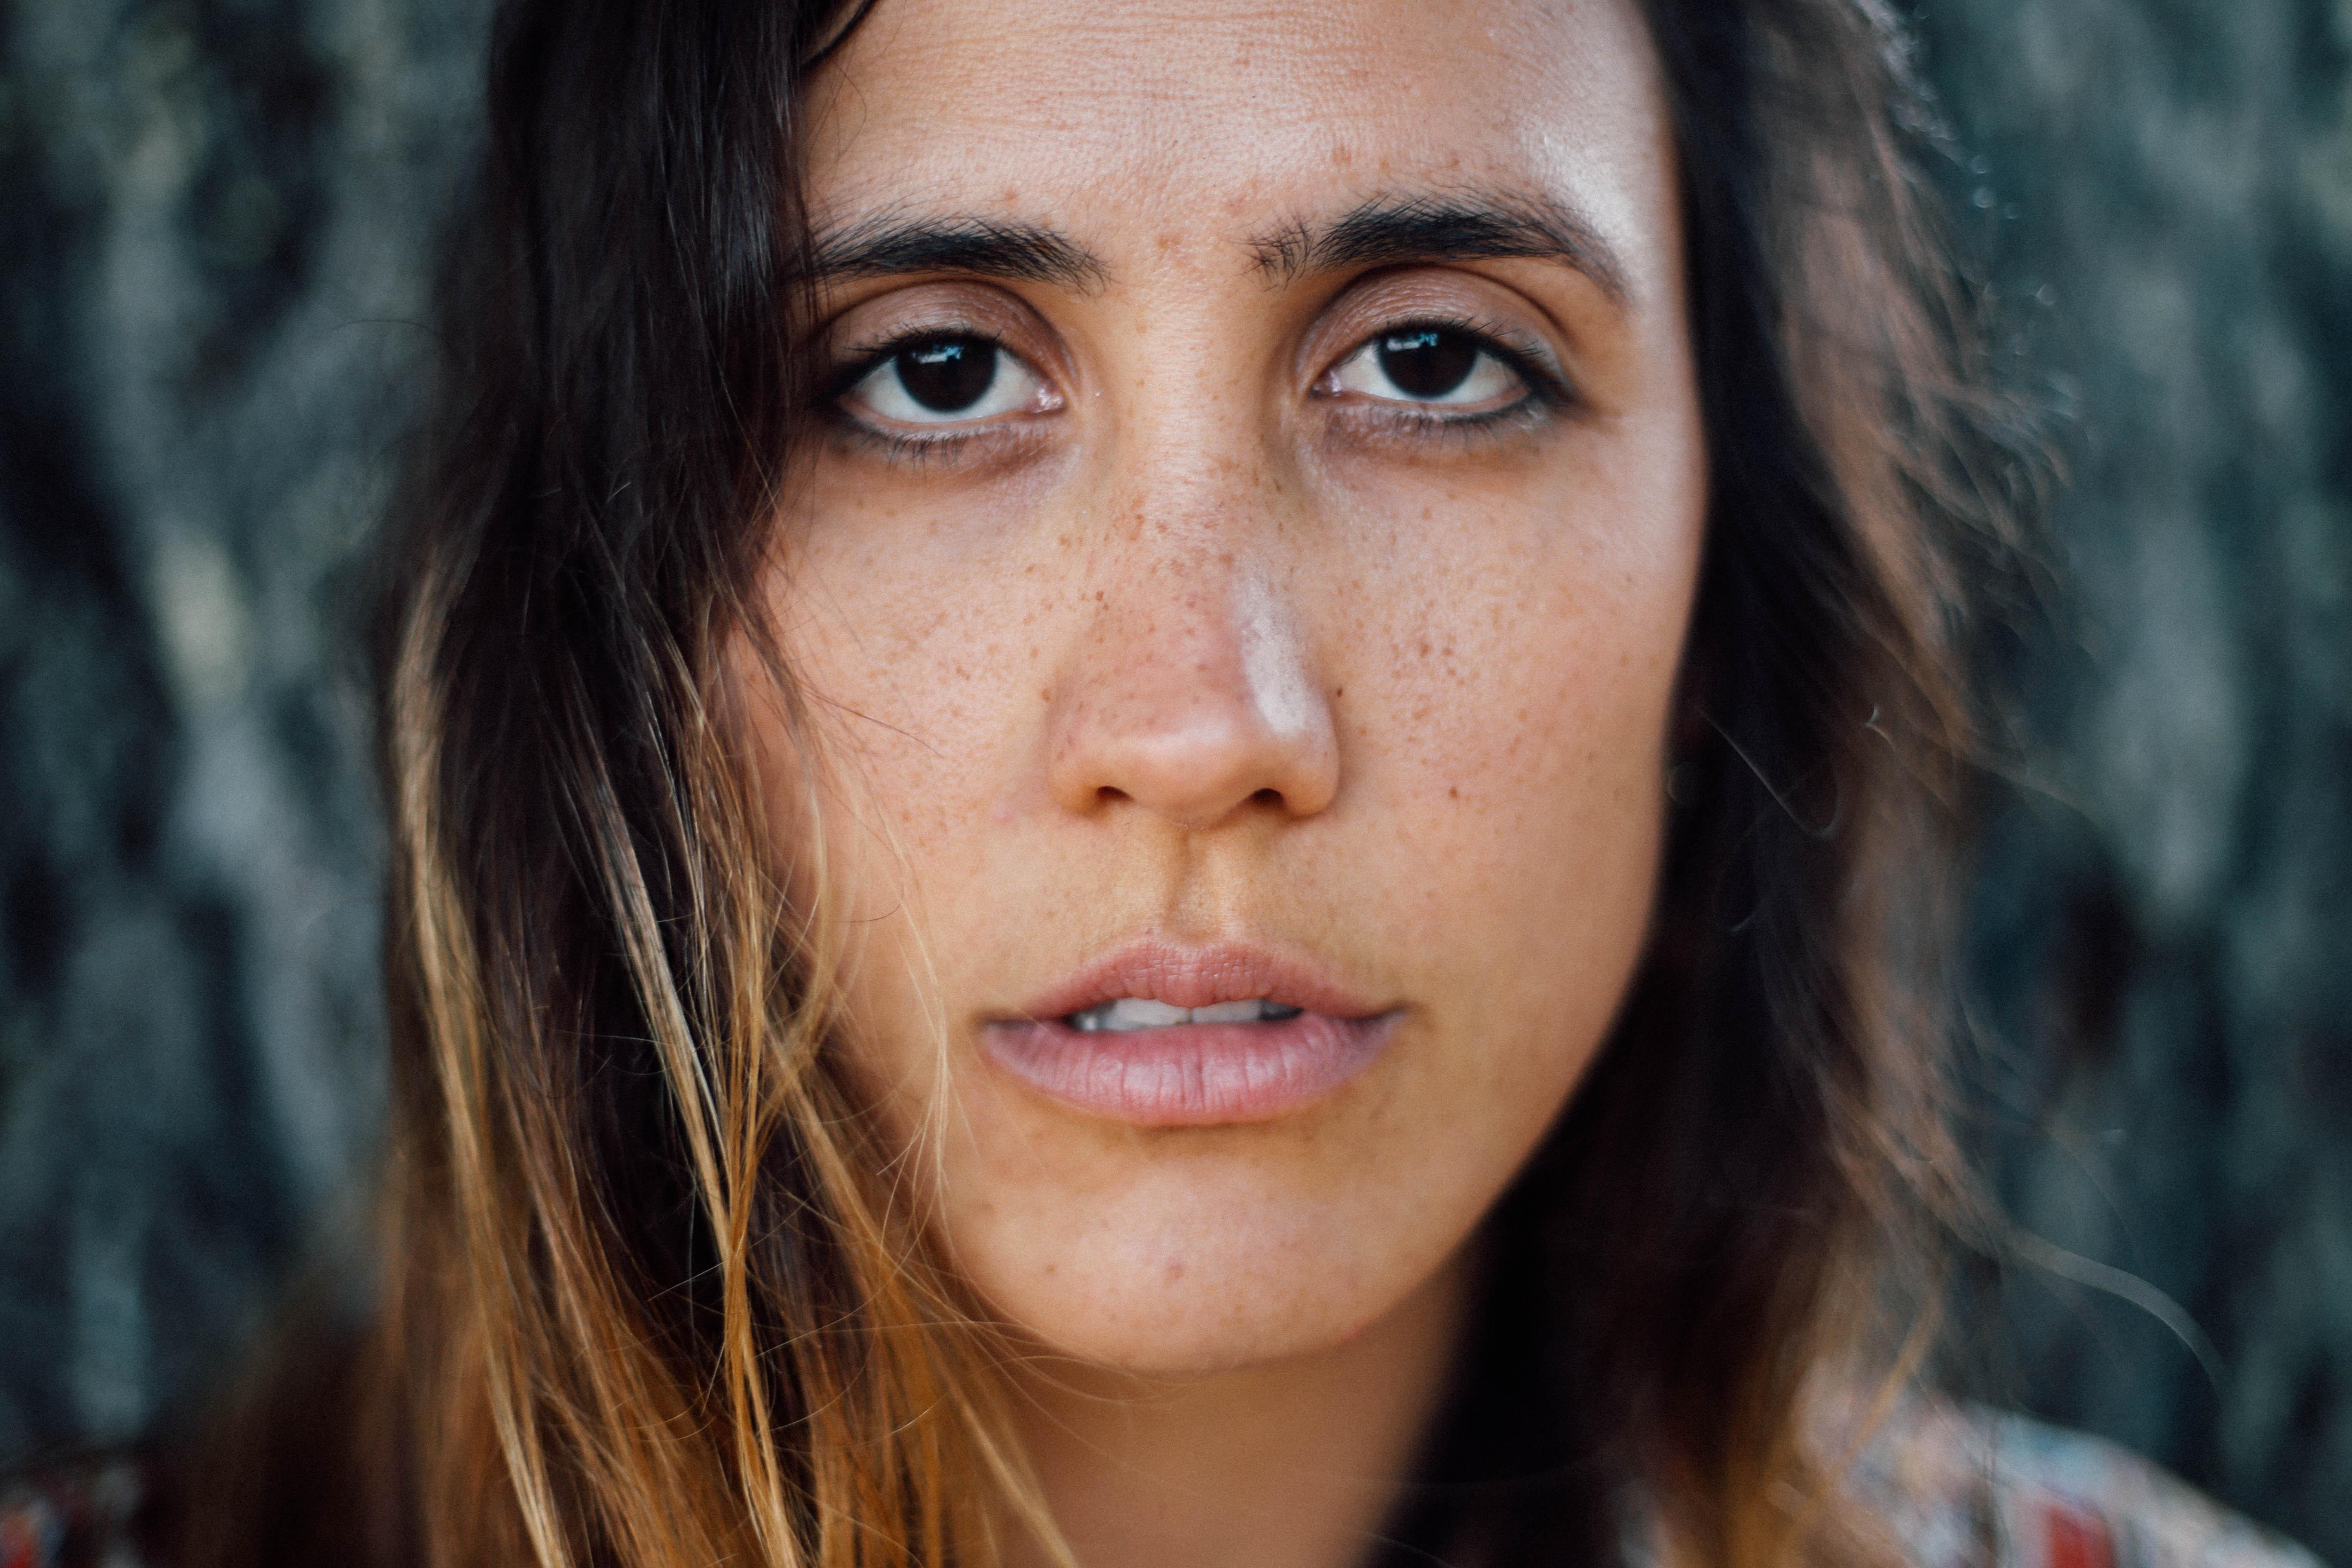 LISTEN: Megan Keely, 'Love Will Find You'